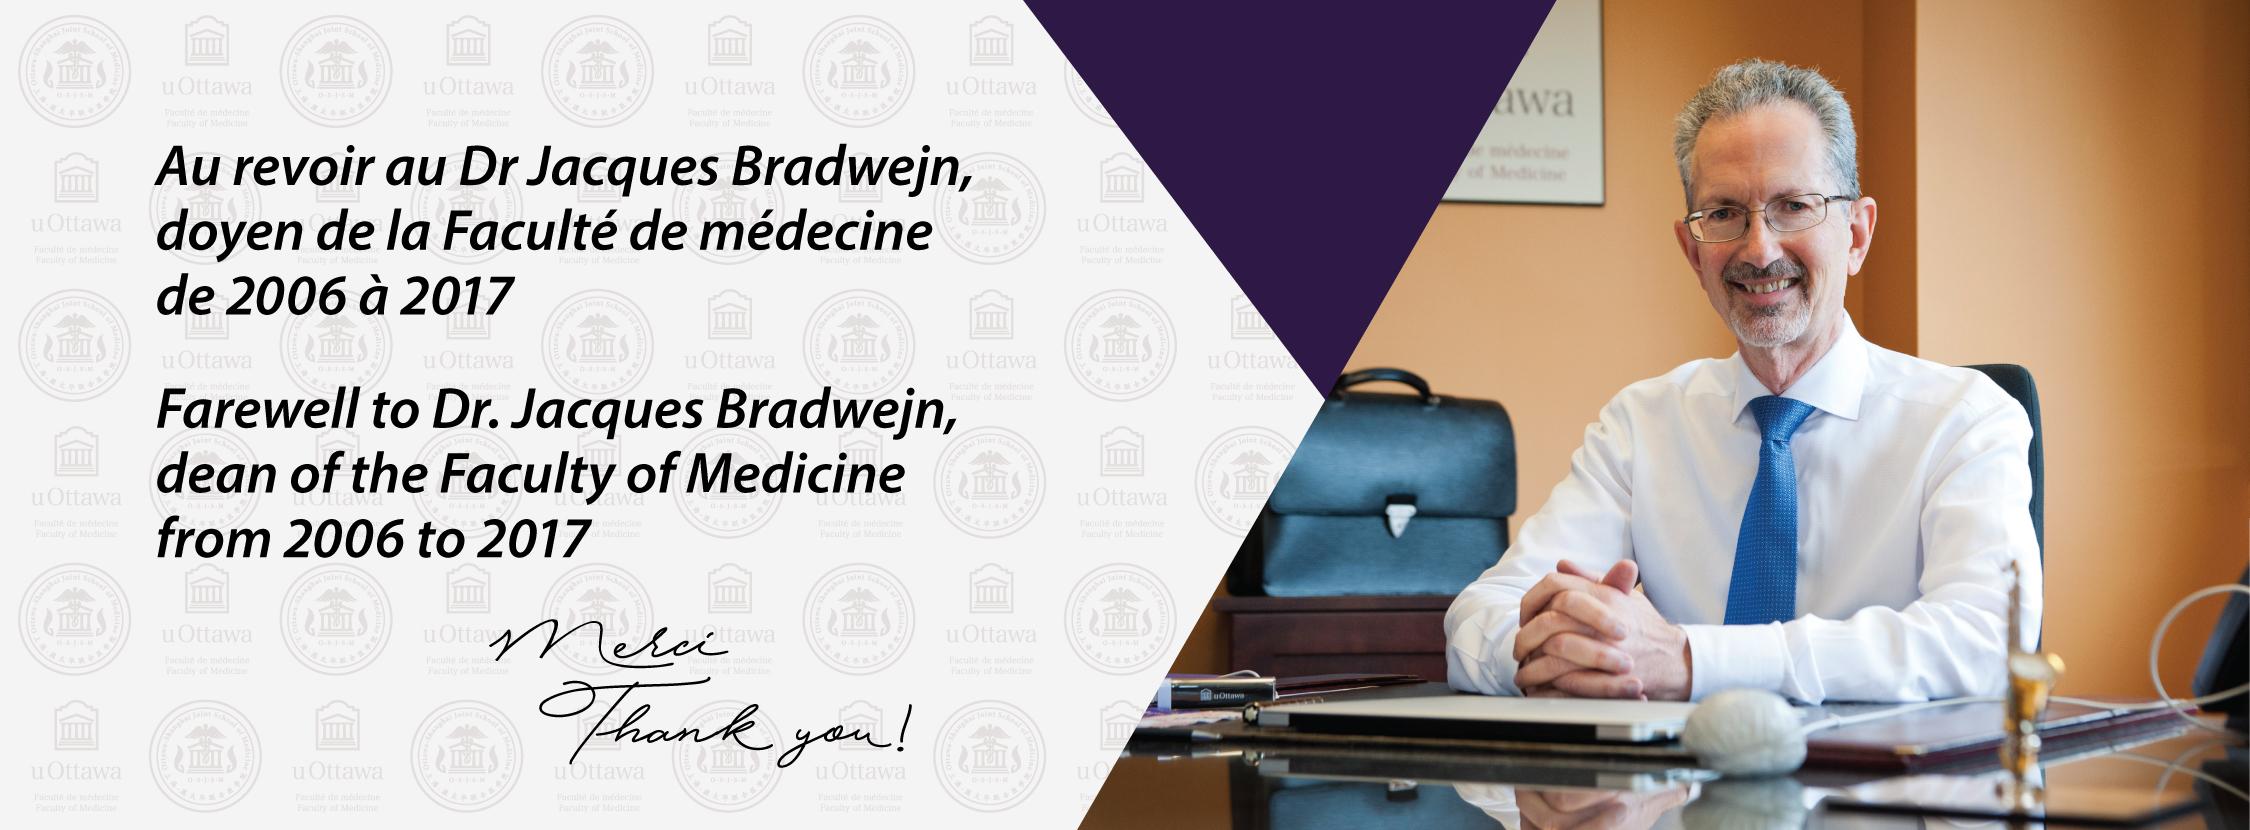 Dr. Bardwin's Fairwell image